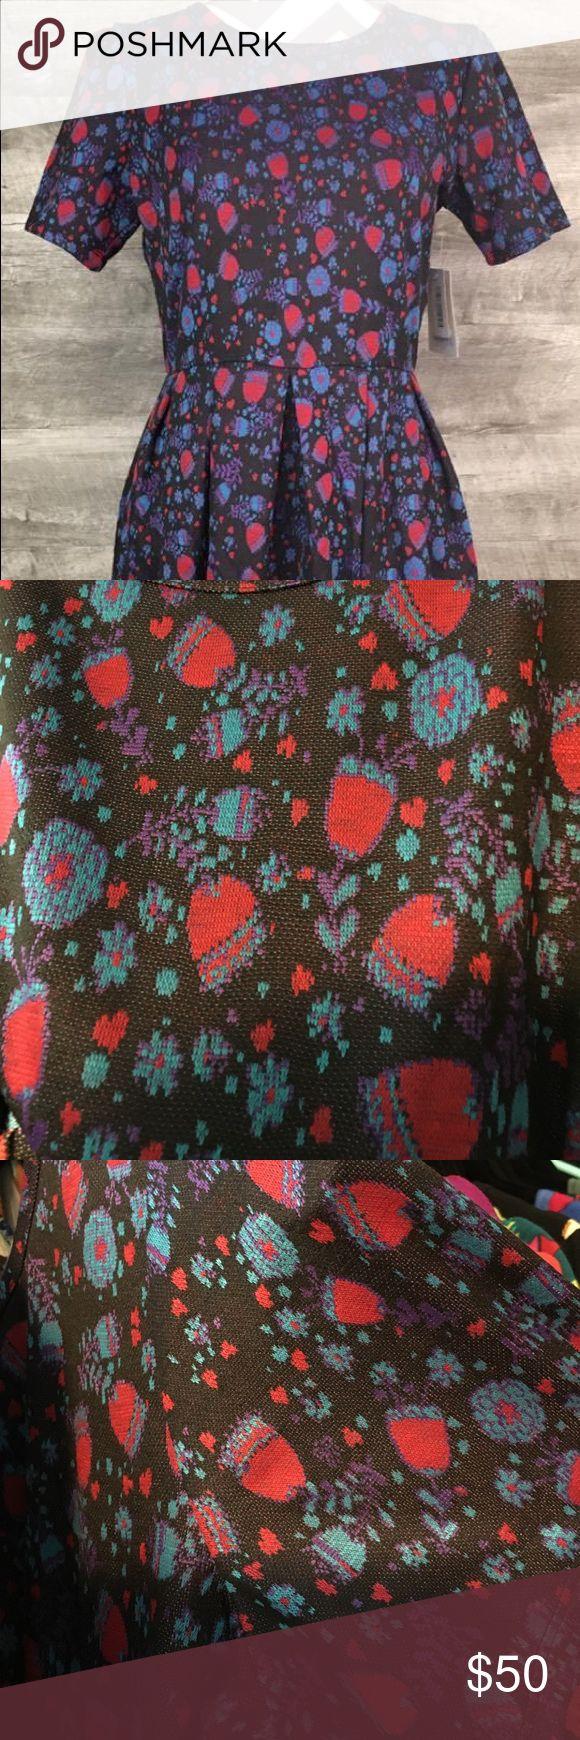 Lularoe Large Amelia Lularoe Amelia size large. Jacquard material. Black background with blue red and purple designs. New with tags. LuLaRoe Dresses